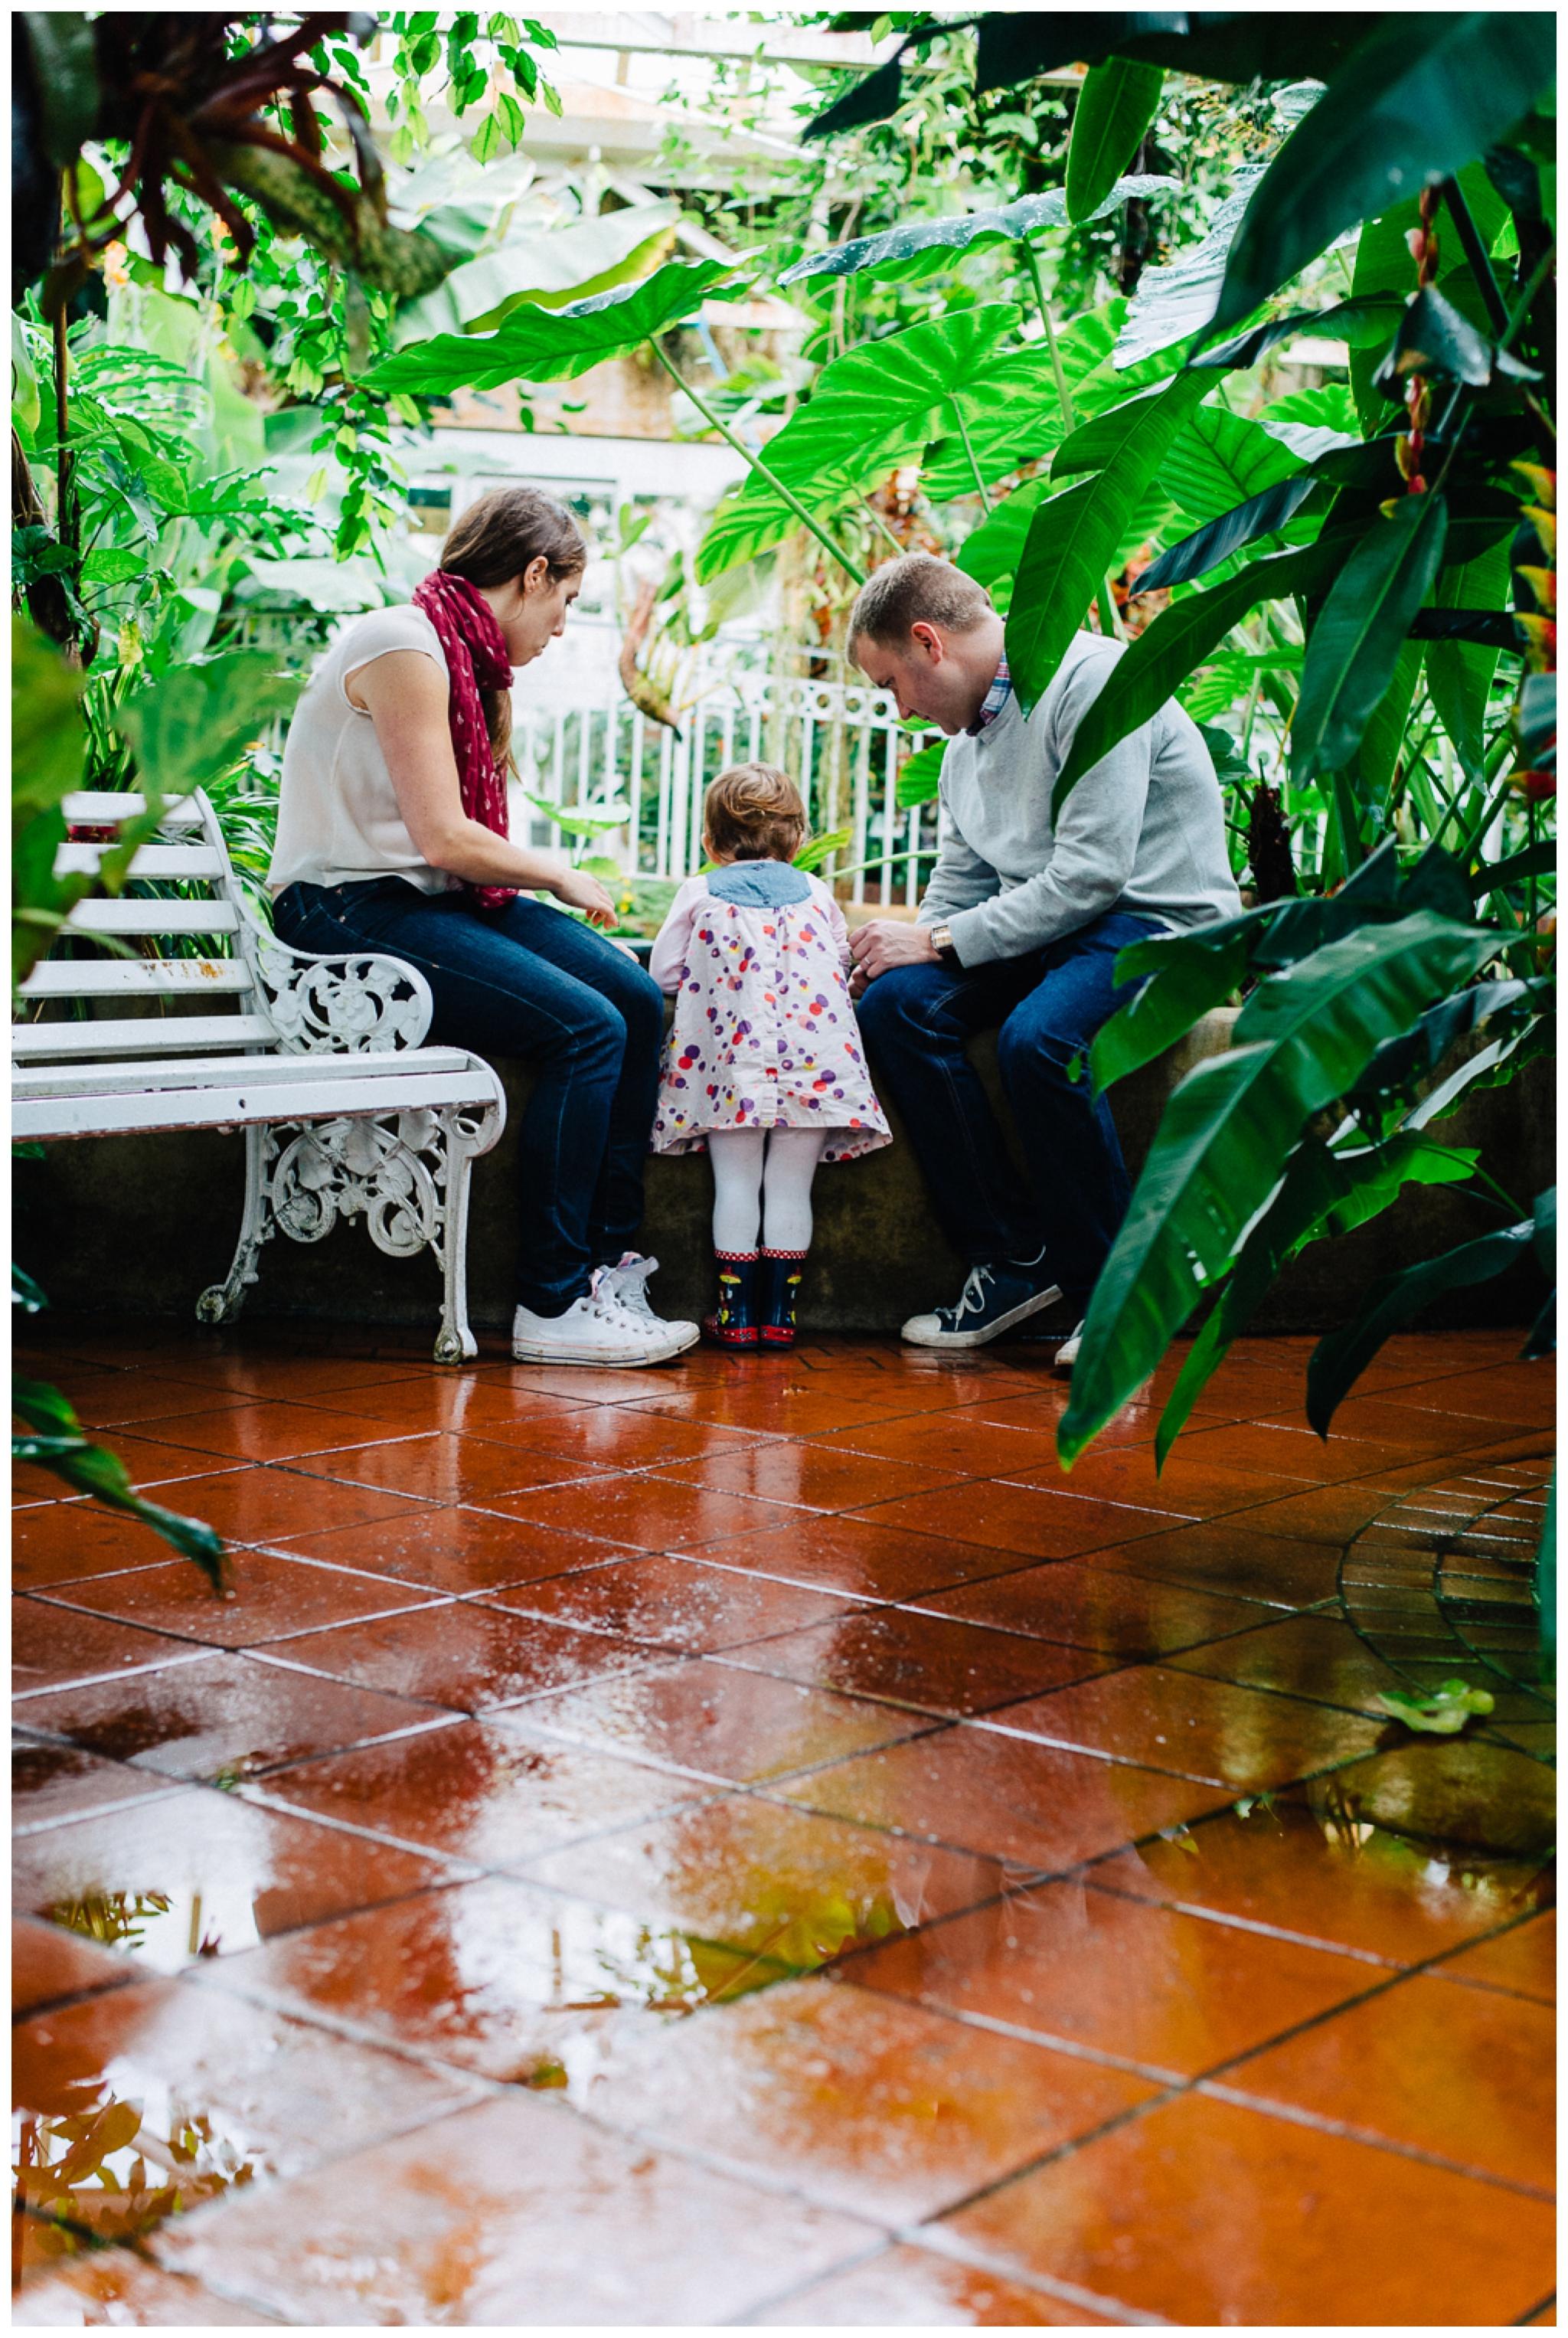 Autumn-family-portraits-birmingham-photographer_0044.jpg